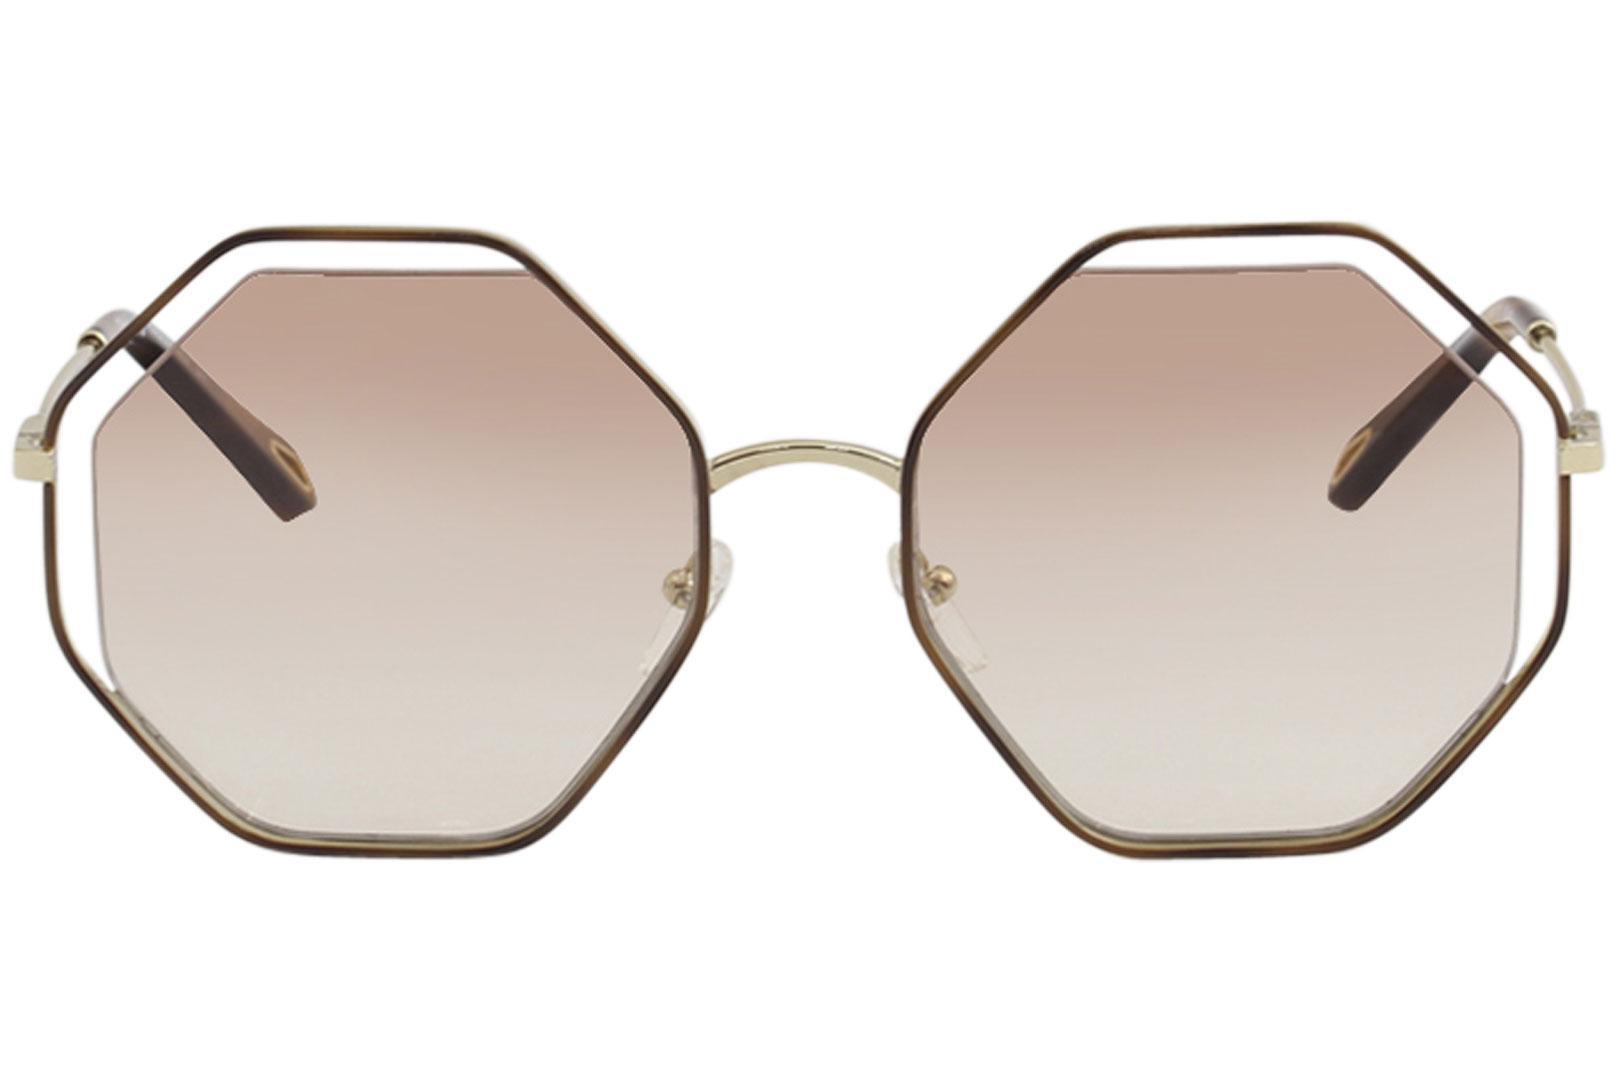 adfc389dce23 Chloe Women s CE132S CE 132 S Fashion Round Sunglasses by Chloe. 12345